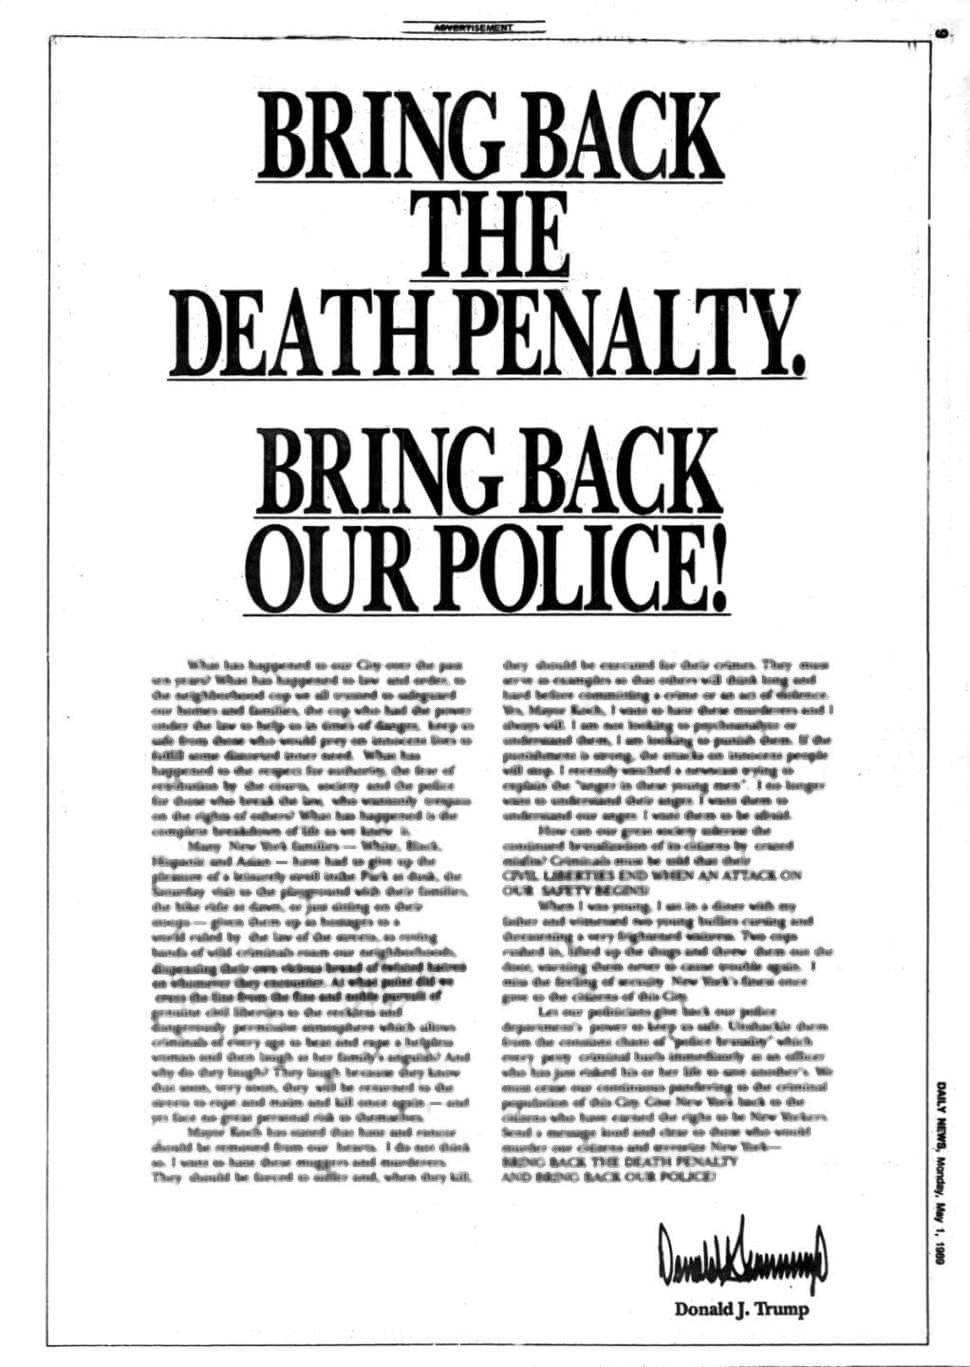 Trump Bring Back Death Penalty ad 1989